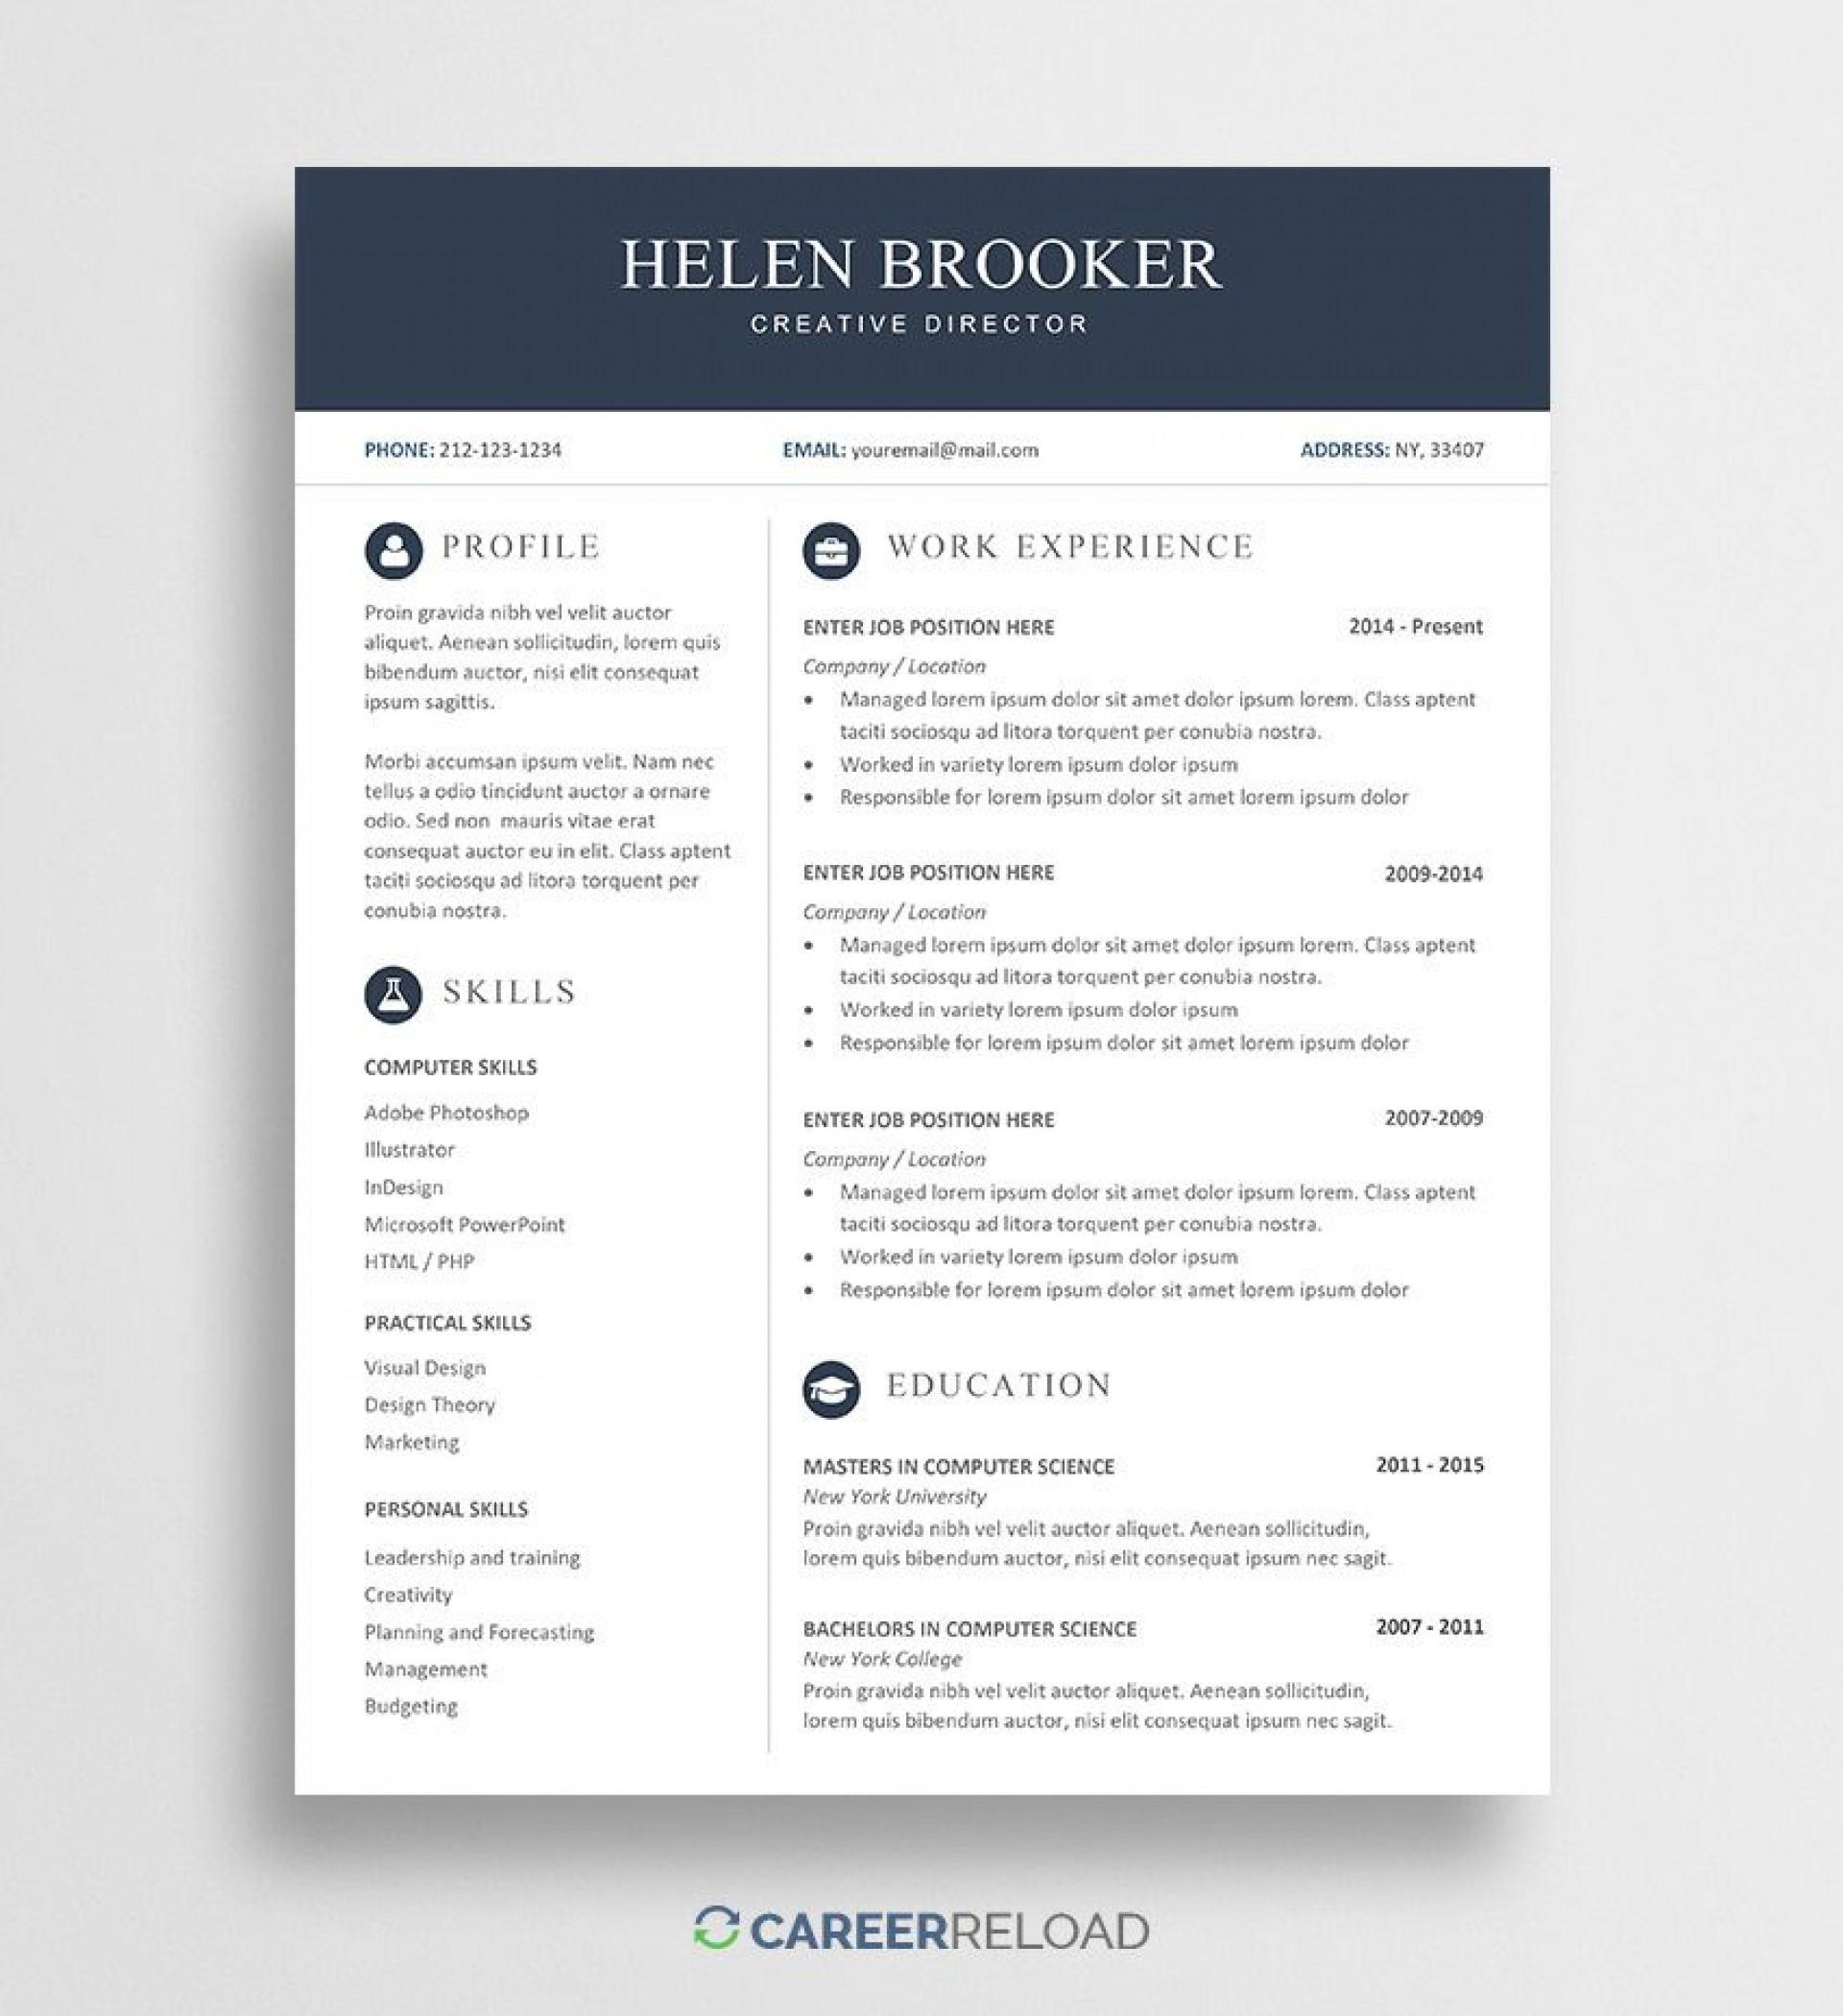 007 Unusual Professional Cv Template Free Word Inspiration  Uk Best Resume Download1920